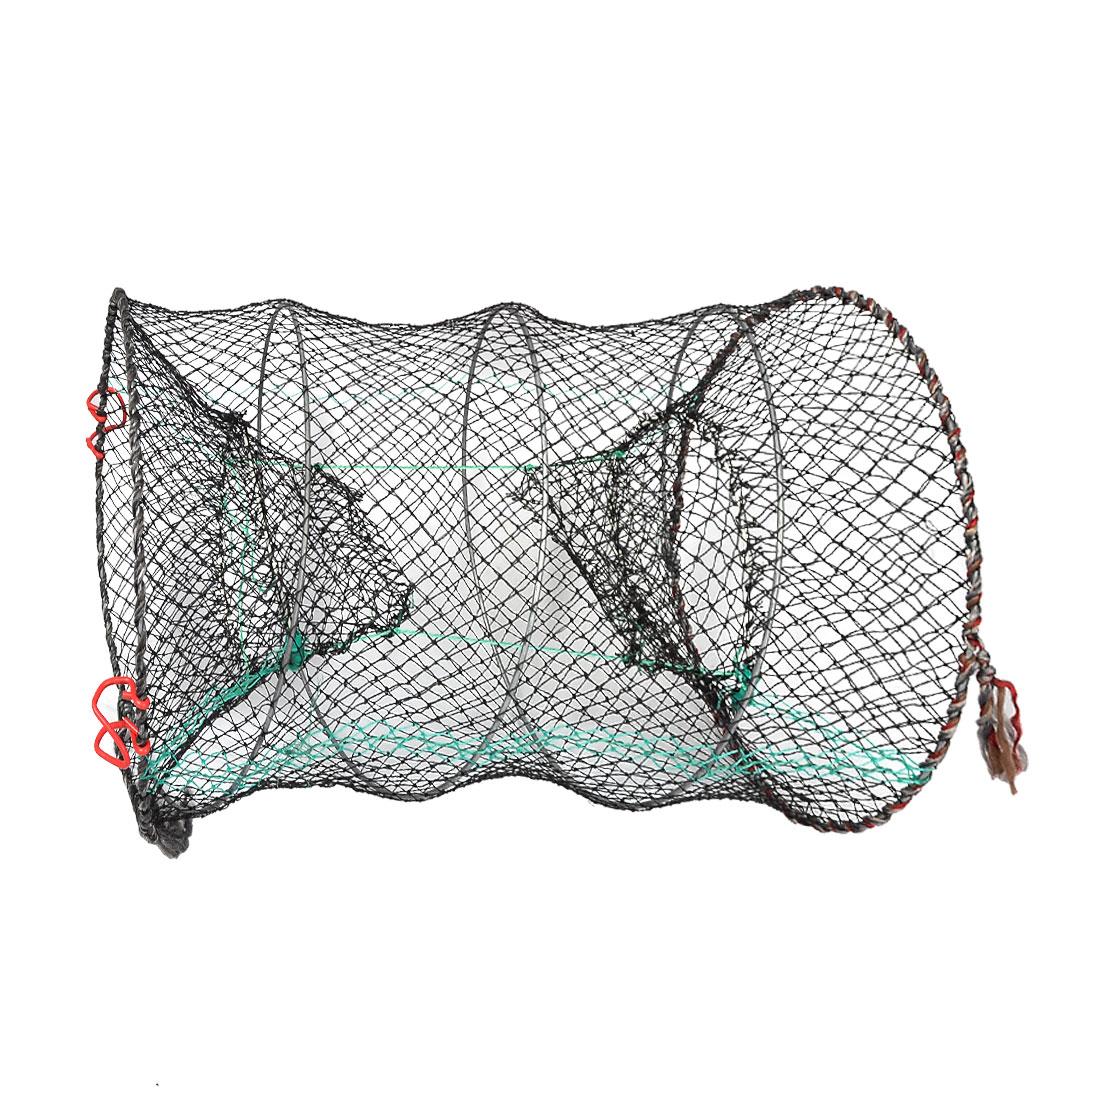 "17.7"" Tall Crab Crawfish Shrimp Foldable Nylon Fishing Keep Net"